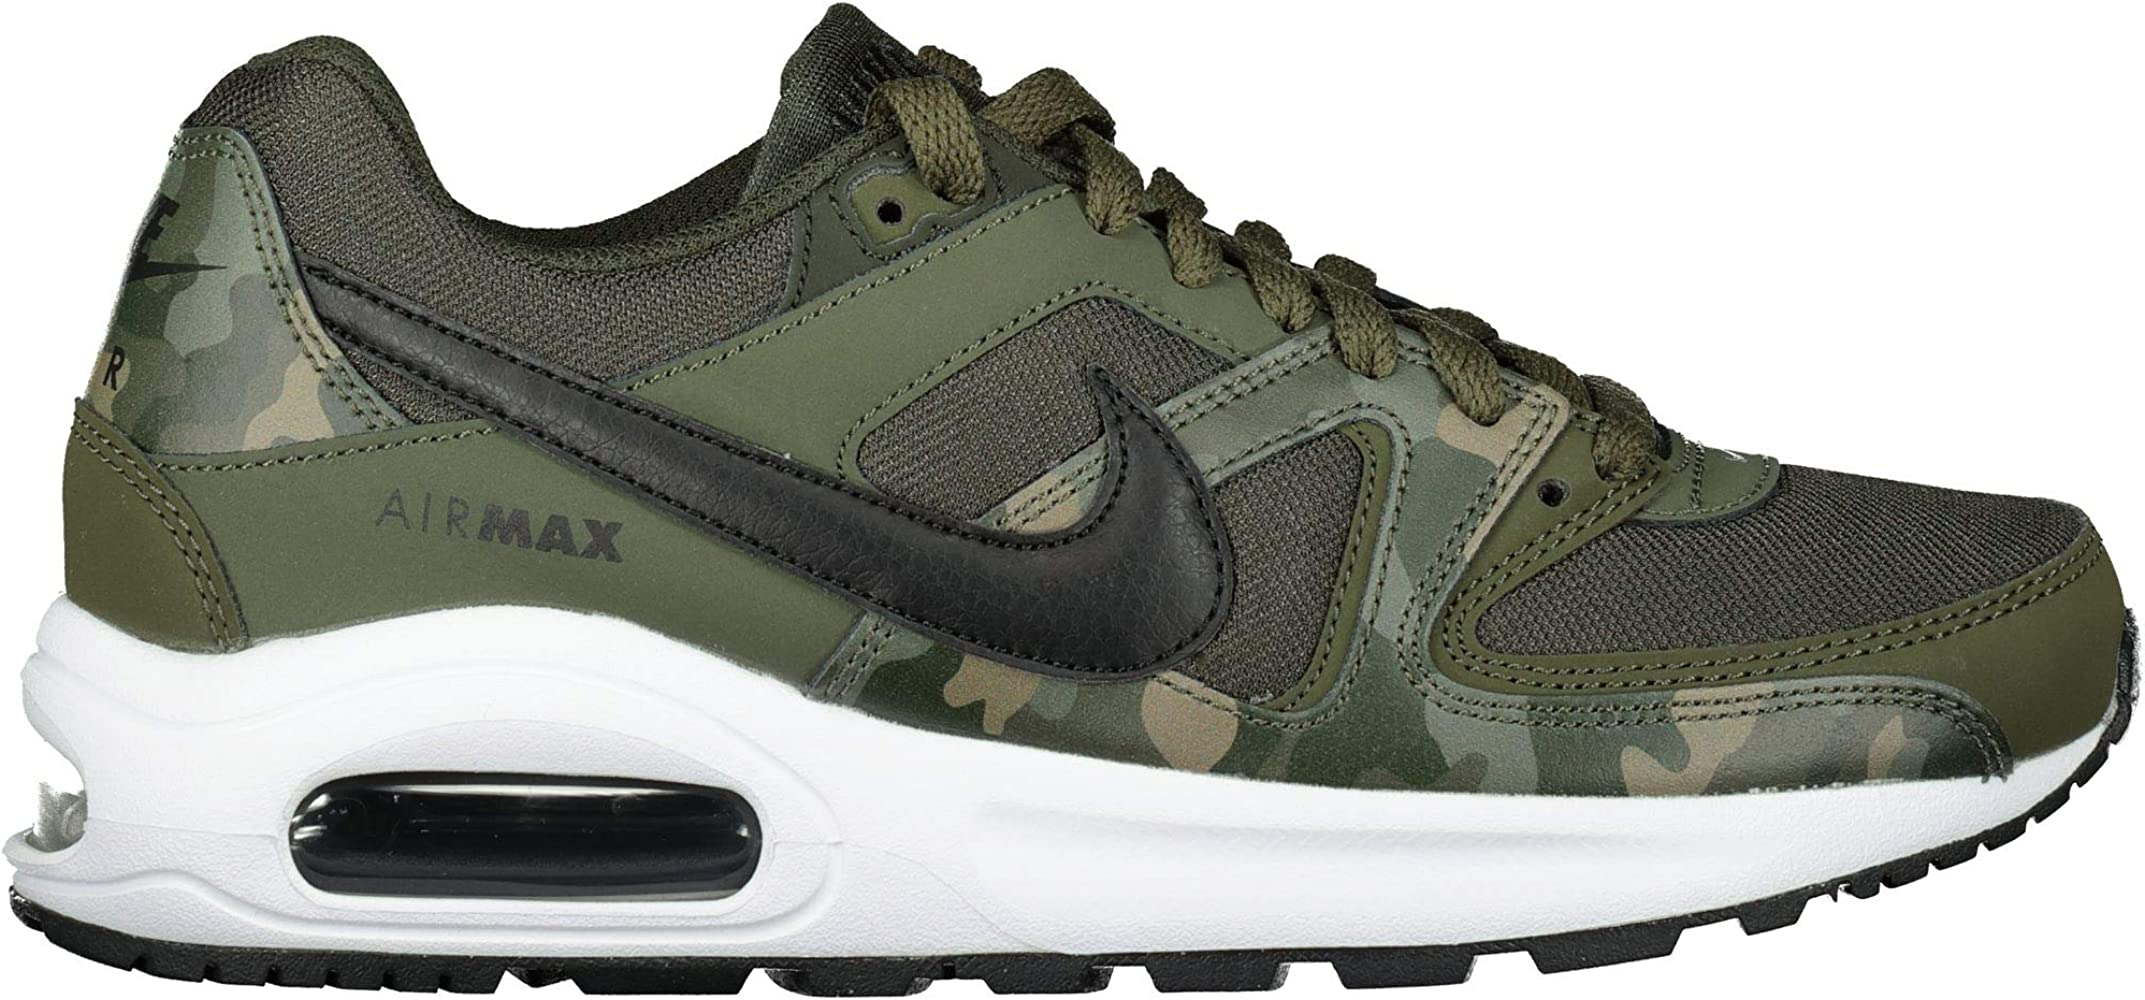 Nike Air Max Command Flex Bg, Scarpe Running Uomo